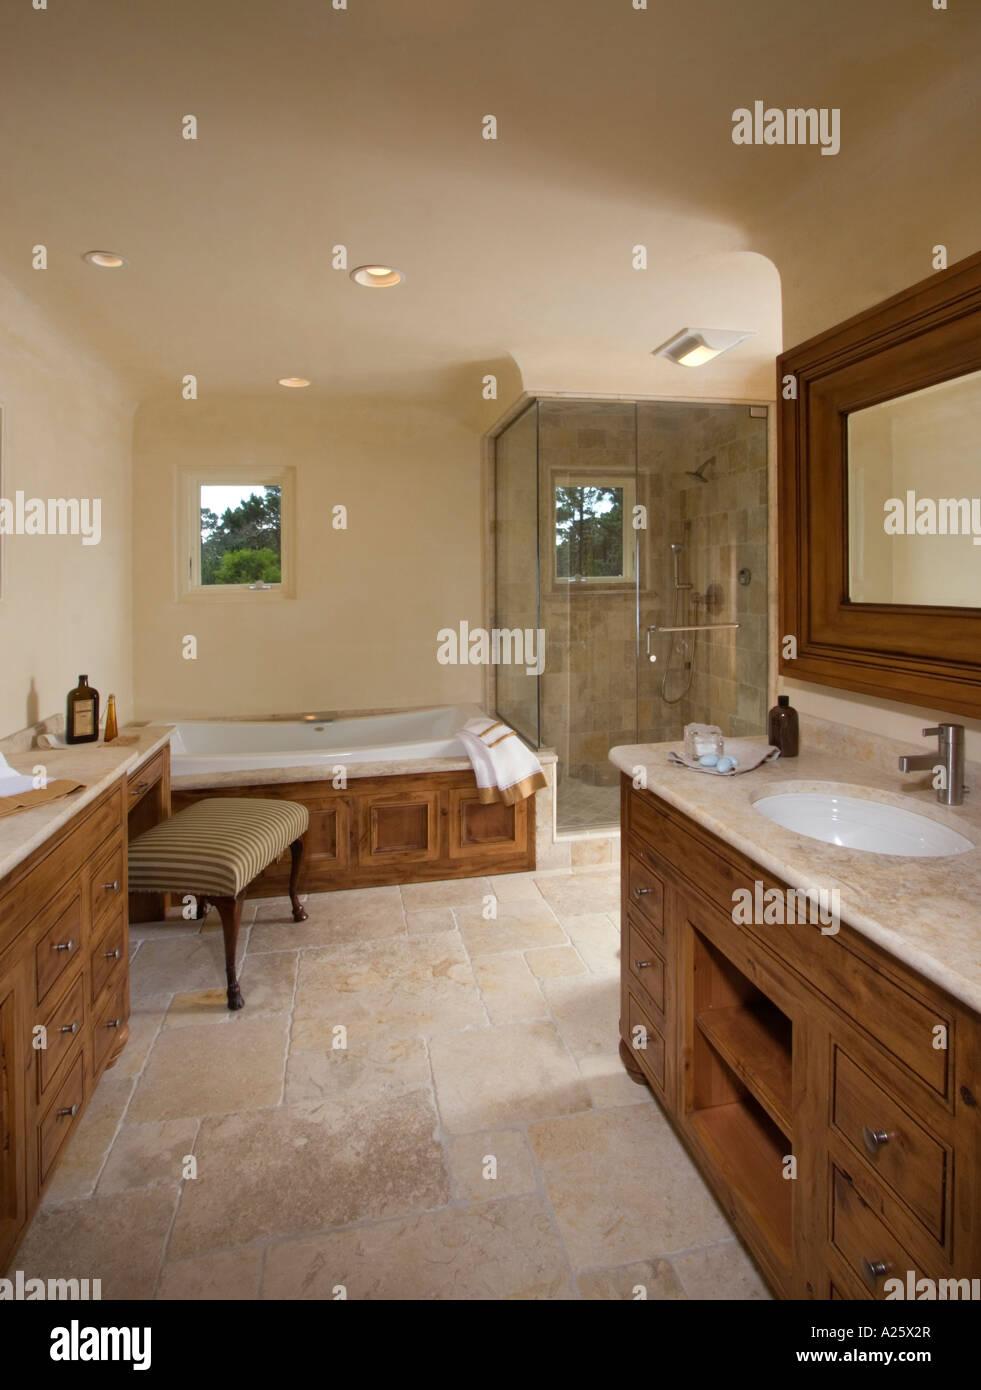 Stone floor sink shower stall and bathtub in a CALIFORNIA LUXURY ...